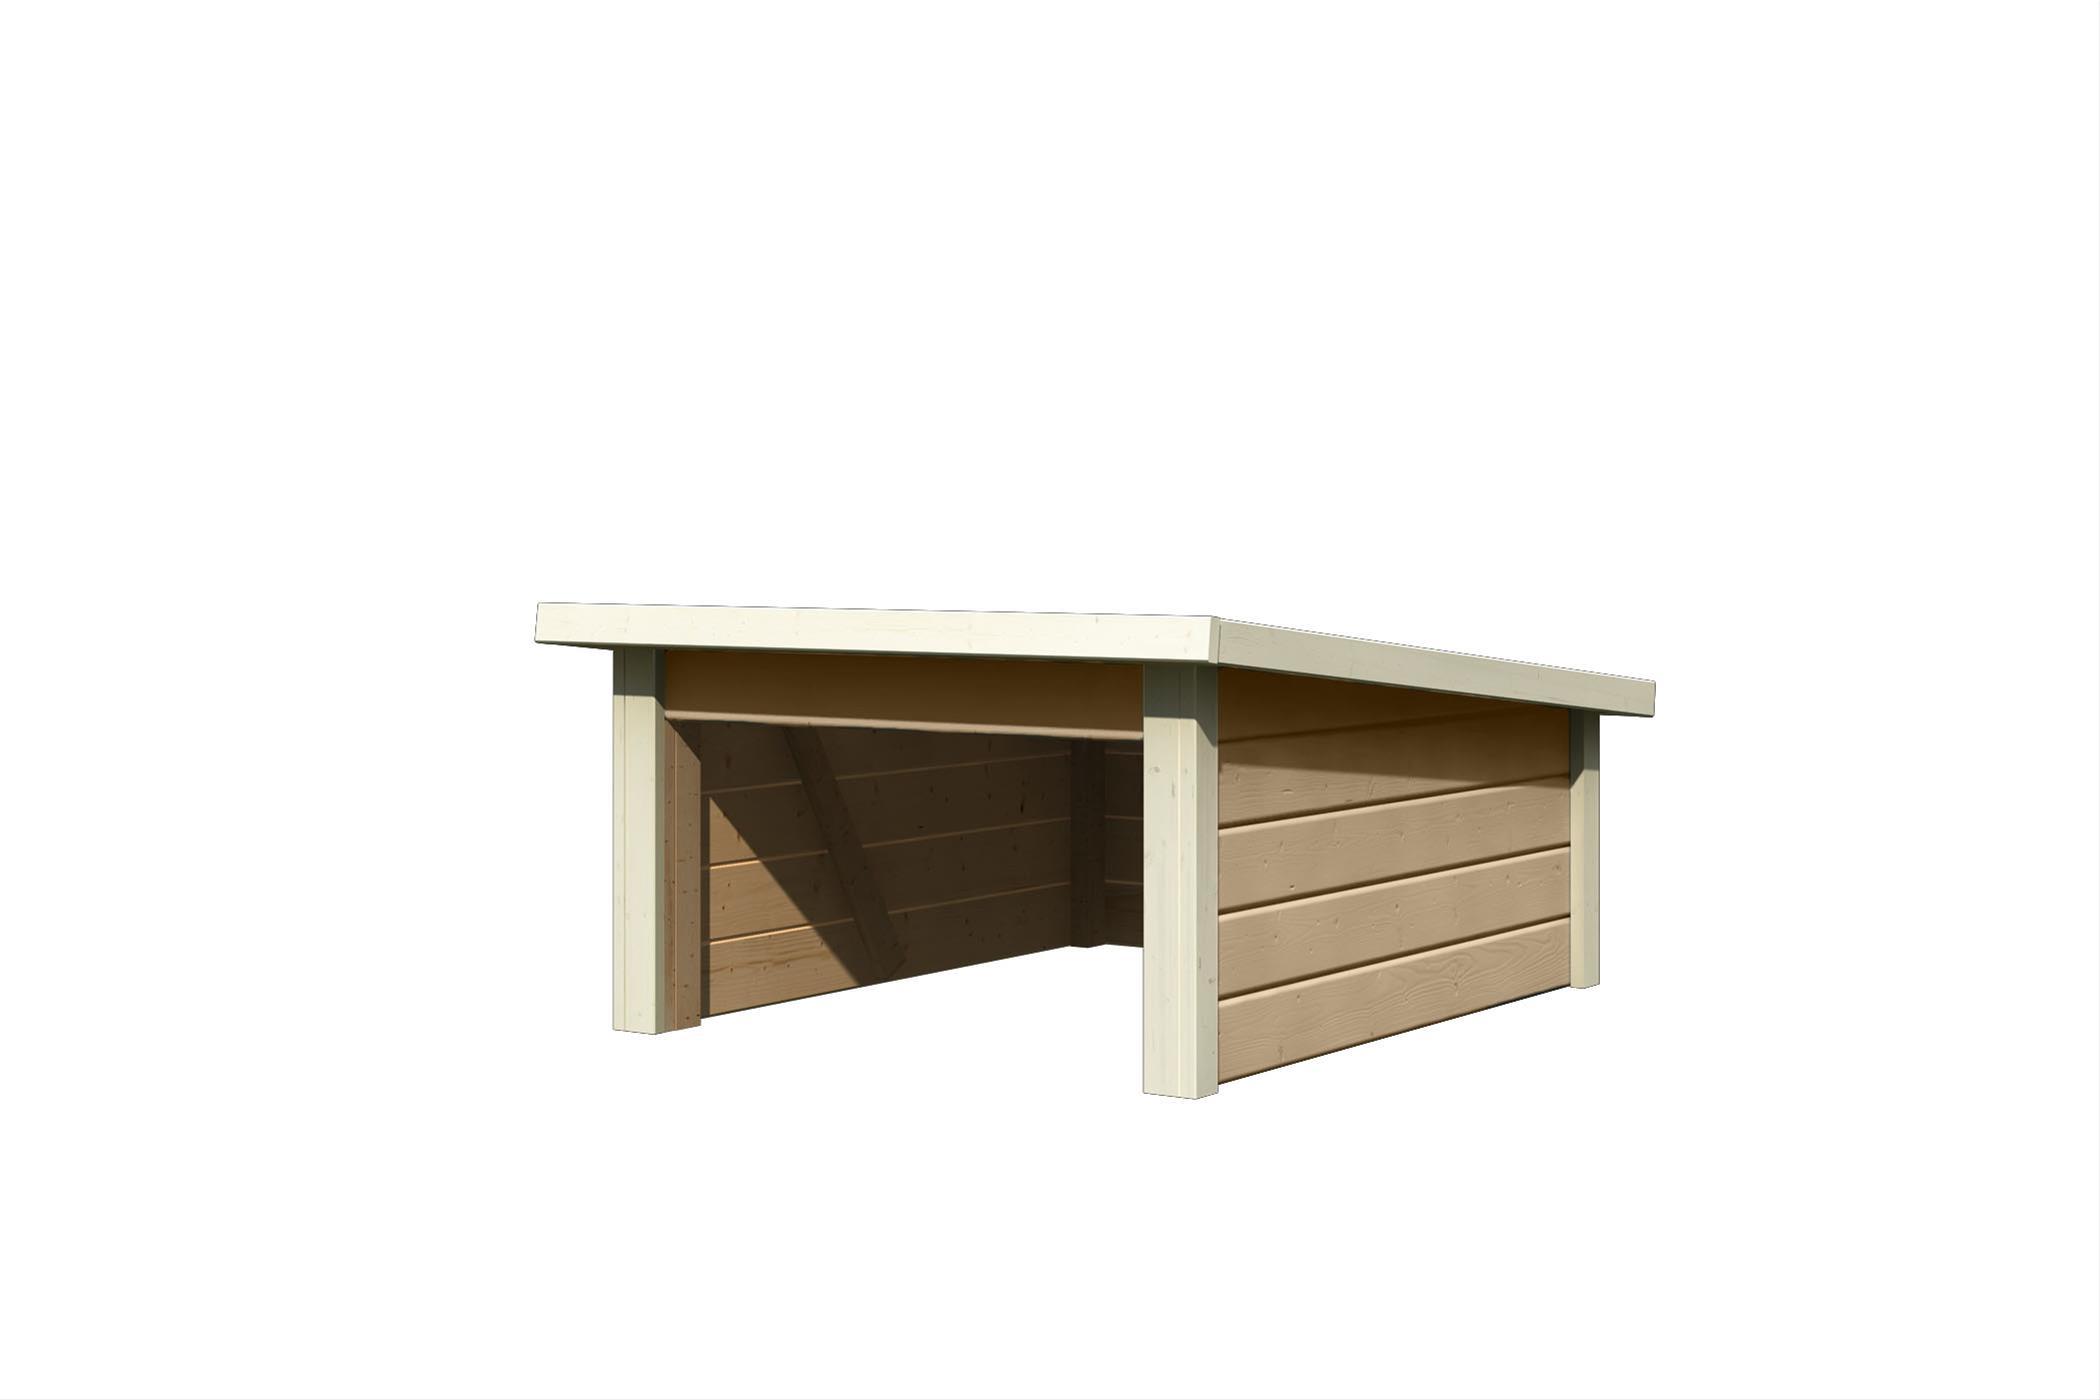 Woodfeeling Mähroboter Haus / Garage 2 sandbeige 79x96x57cm Bild 2